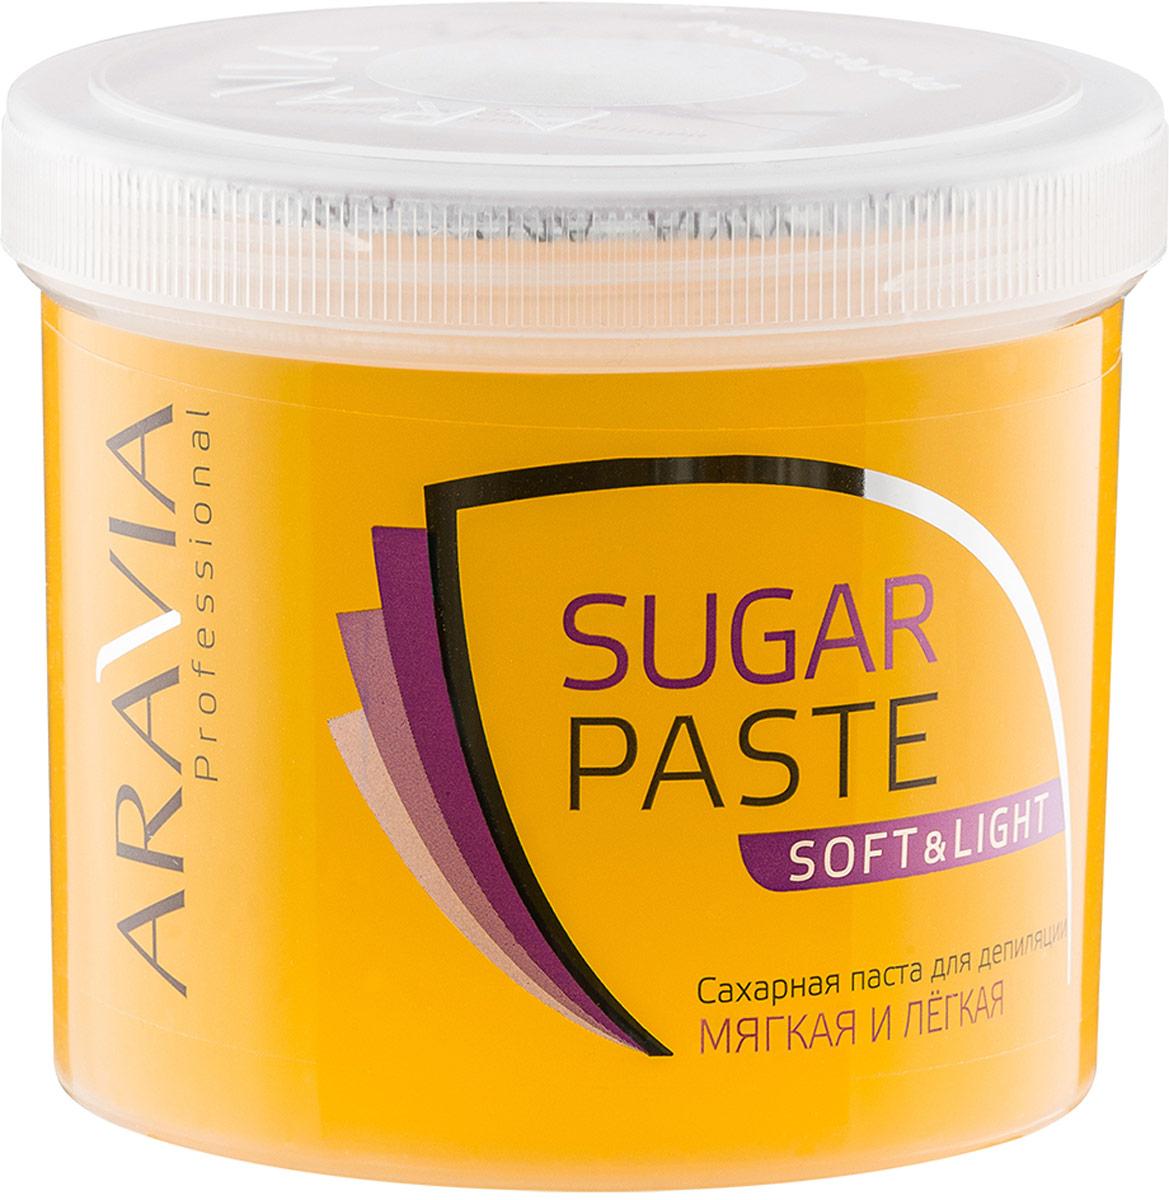 Aravia Professional Сахарная паста для депиляции Мягкая и легкая мягкой консистенции, 750 г